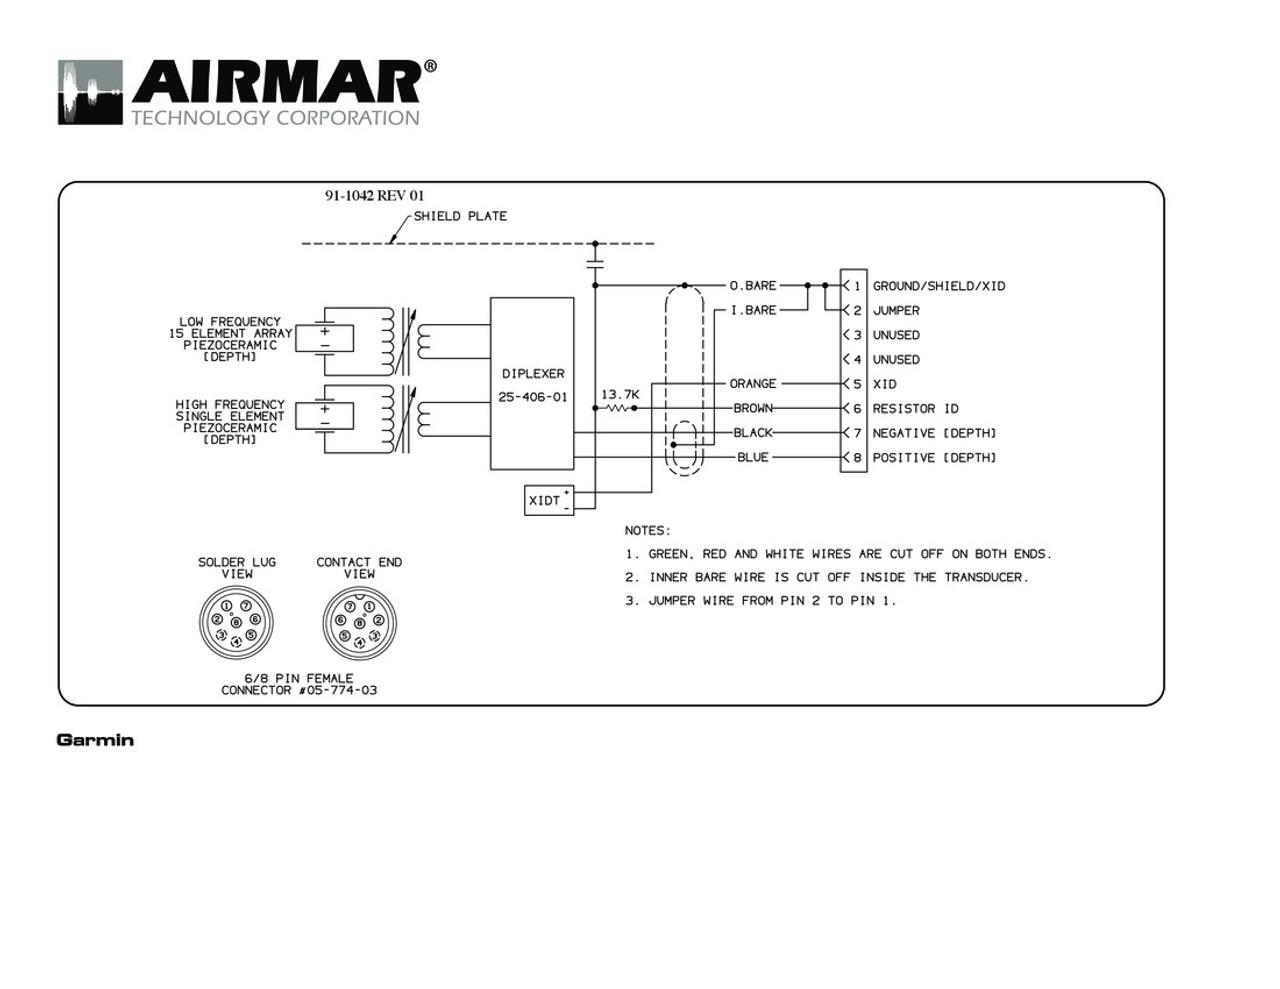 hight resolution of  garmin garmin marine wiring diagrams on garmin network cable wiring garmin 3010c wiring garmin speedometer